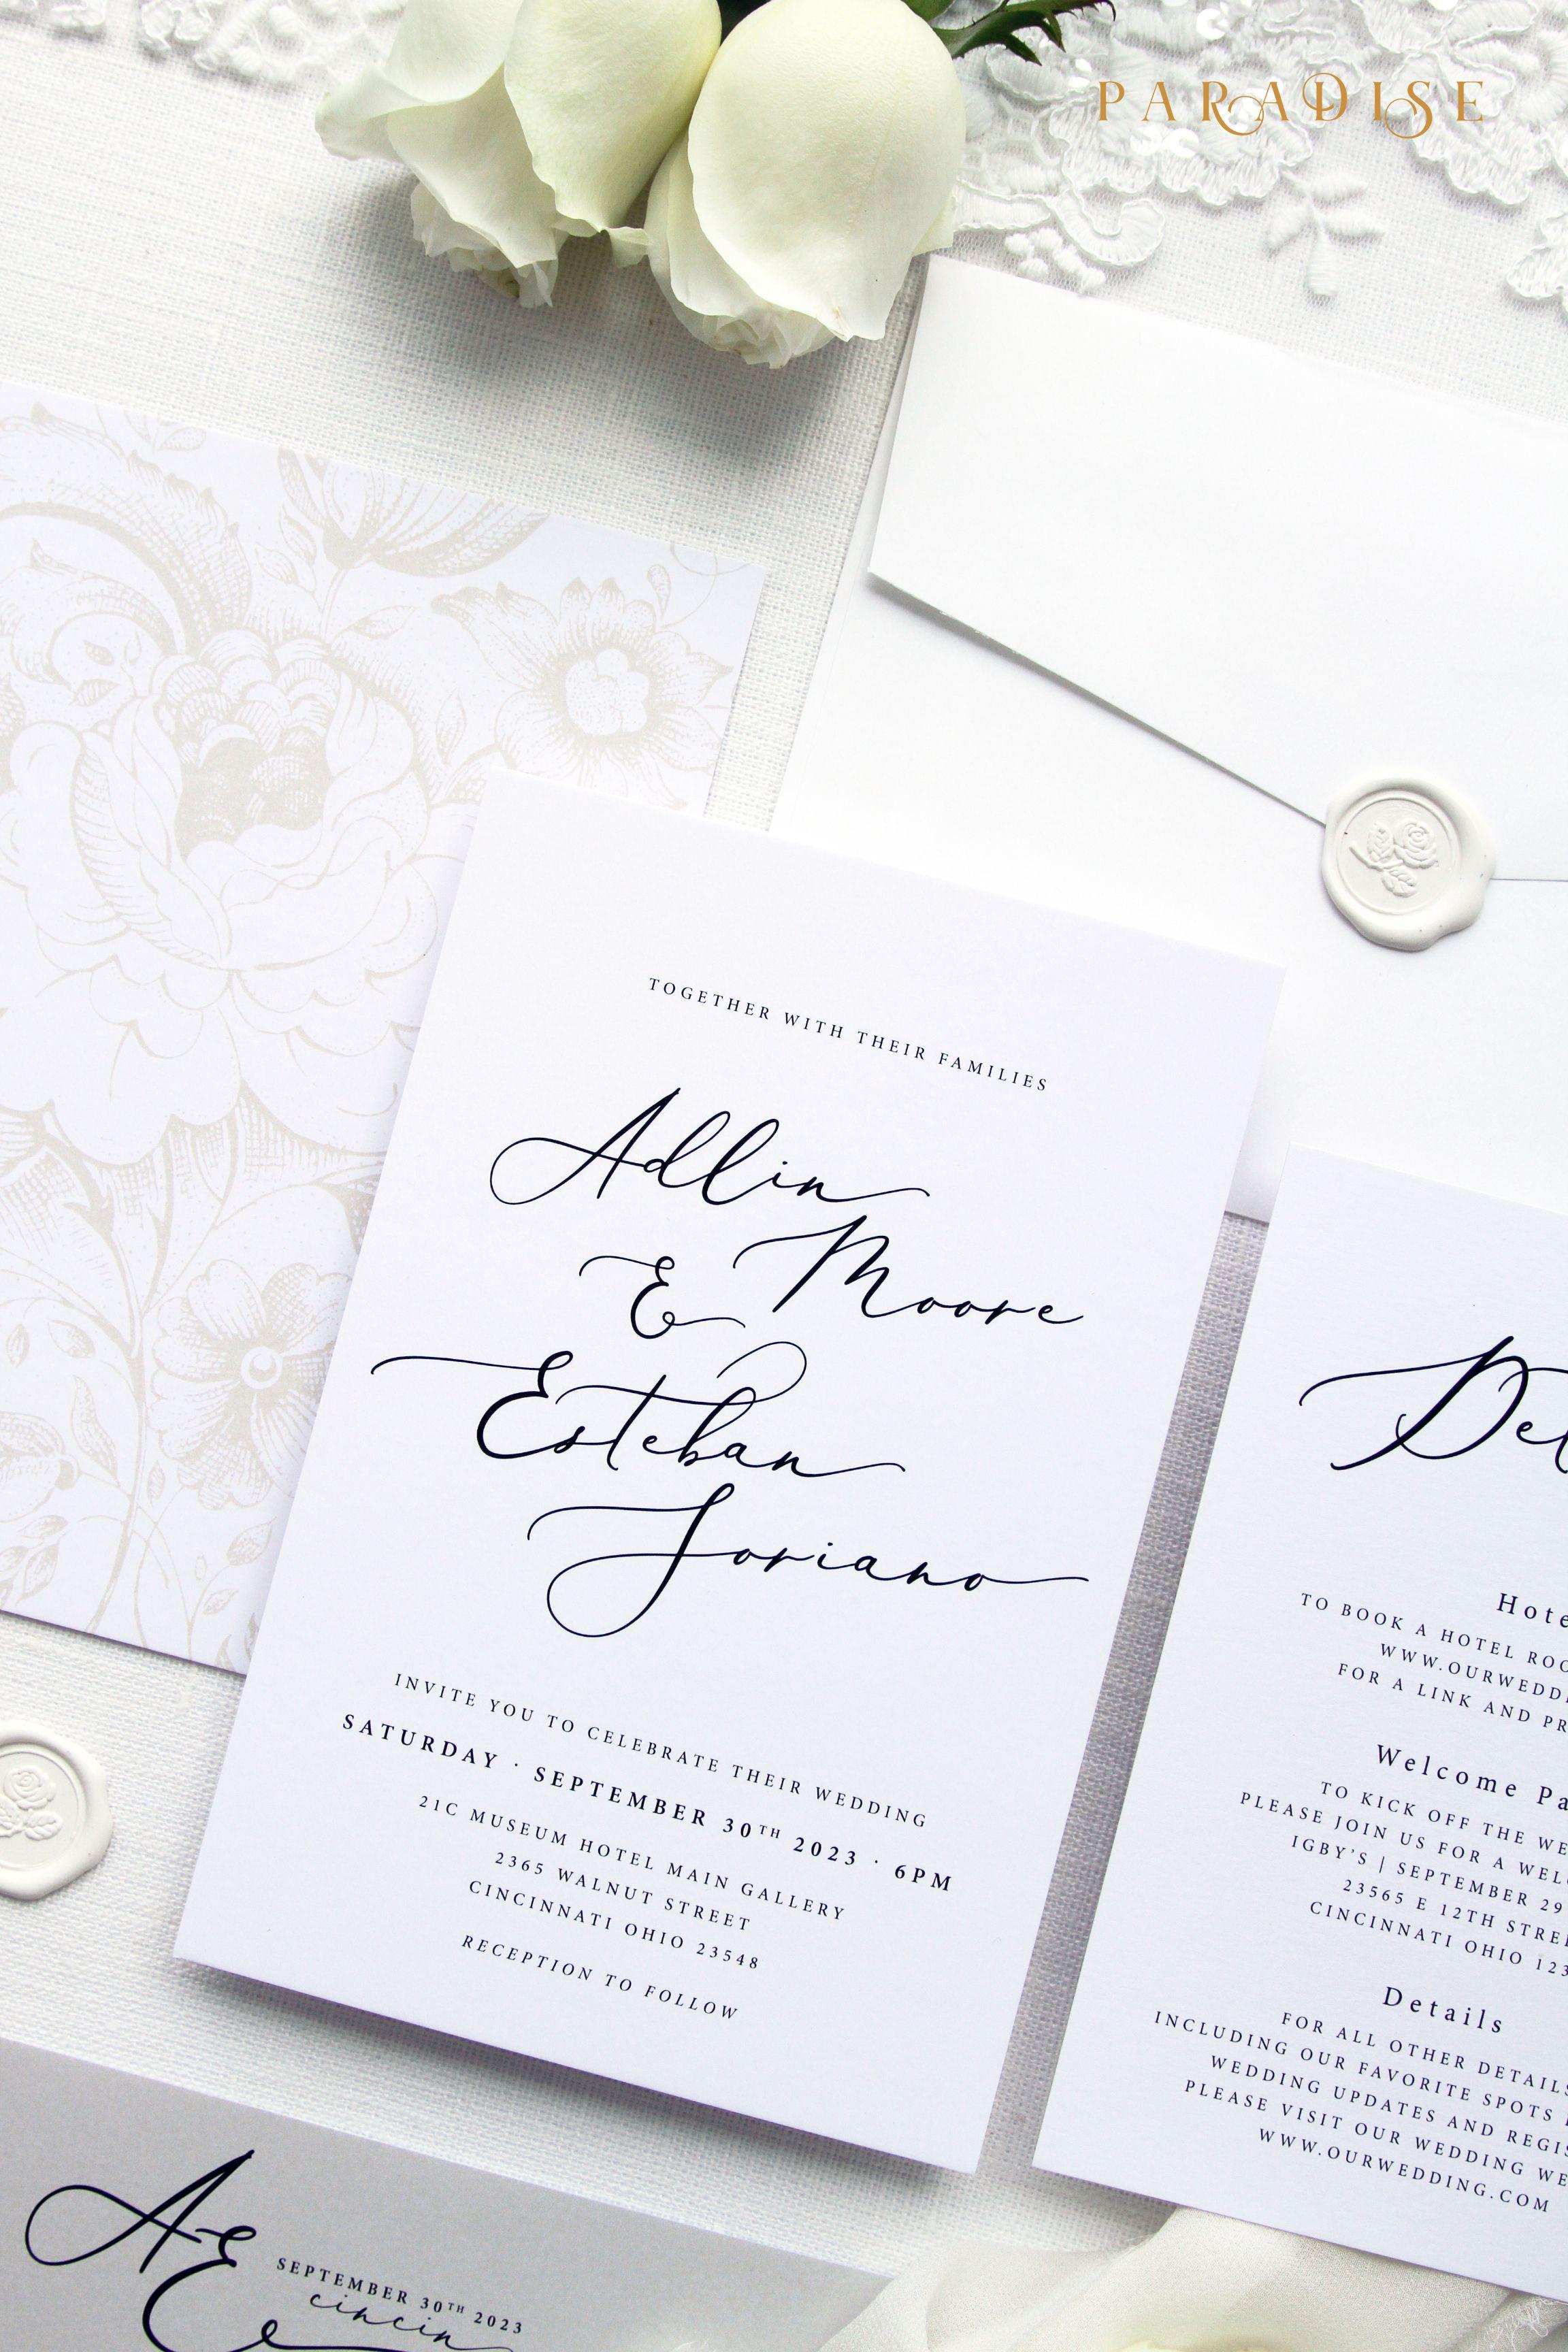 Weddinginvitation Weddings Bride Weddingstationery